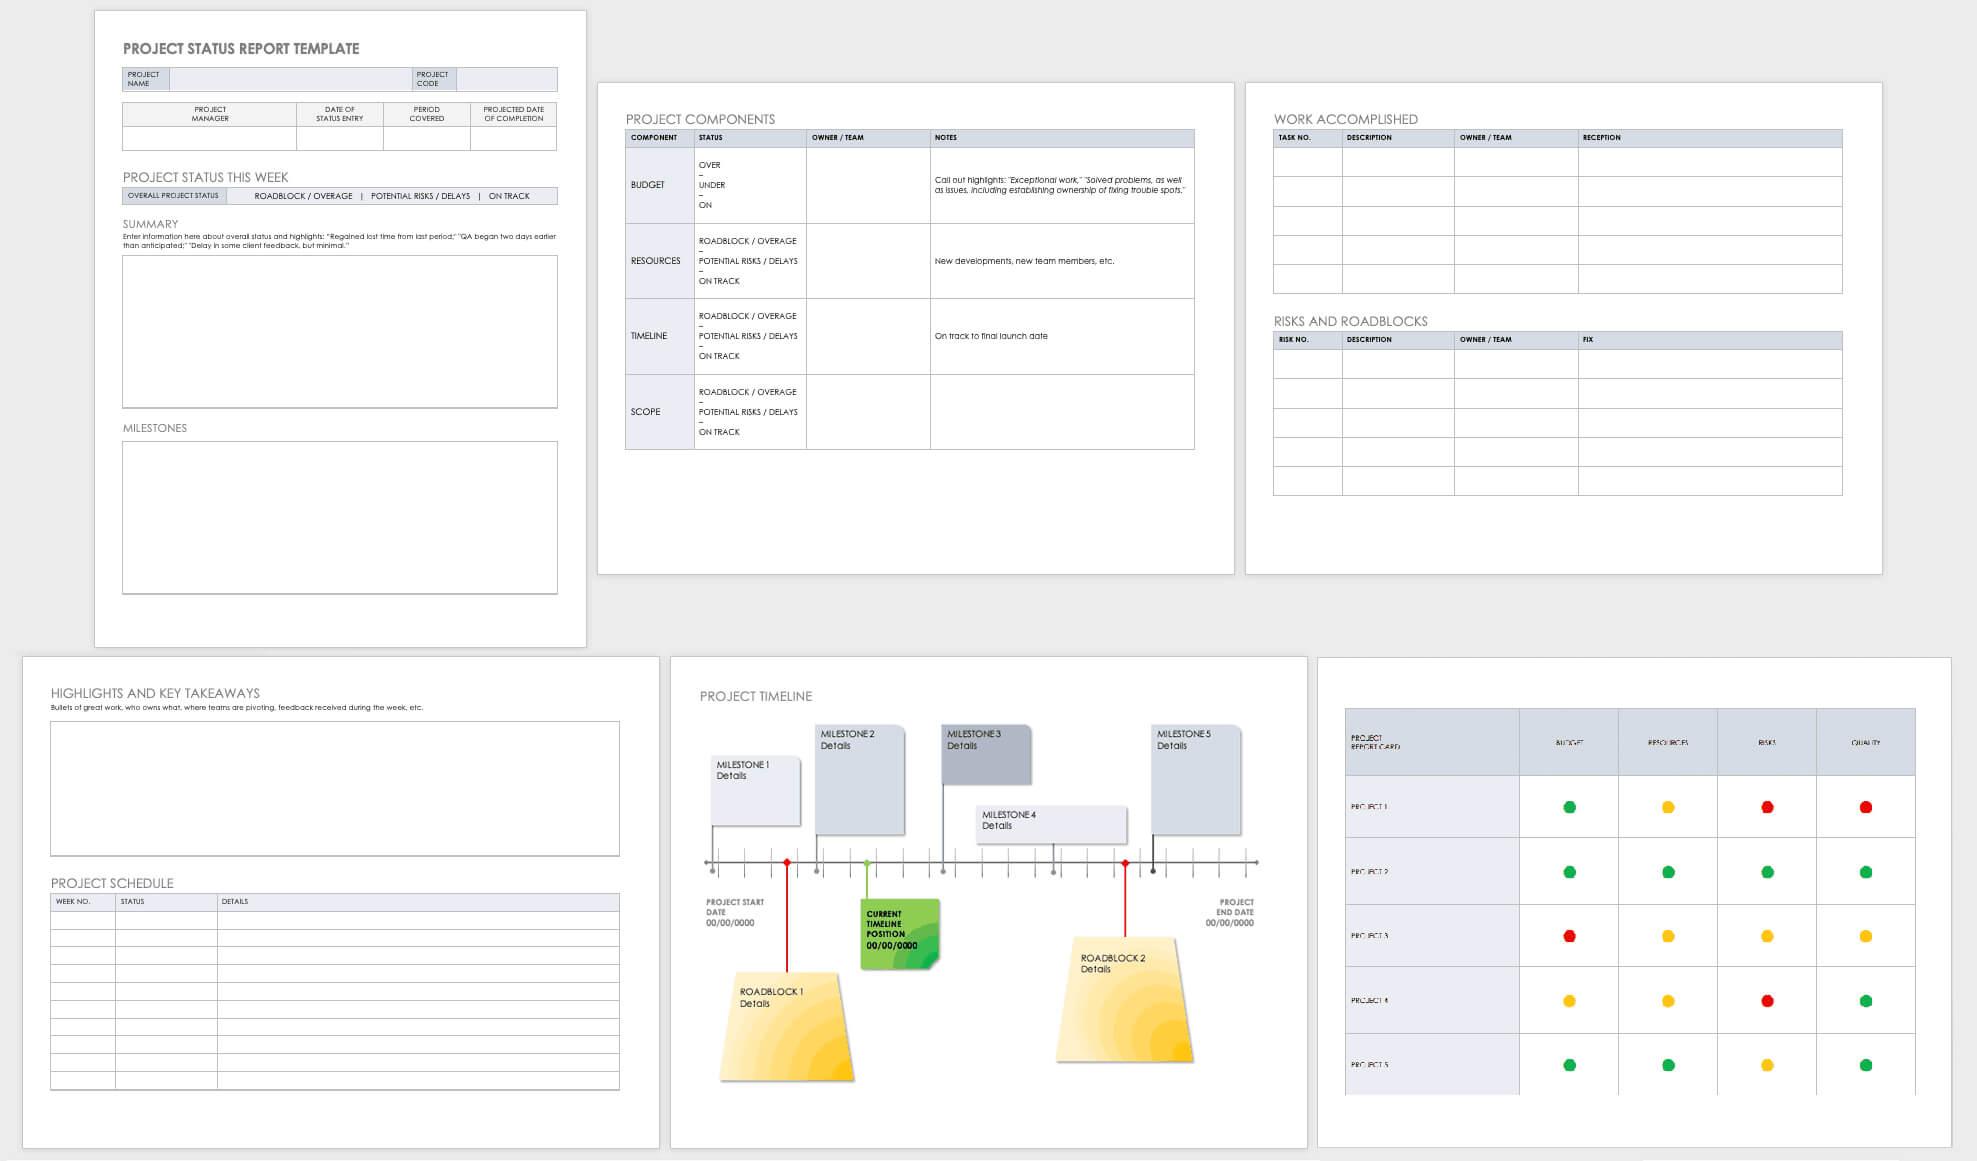 Free Project Report Templates | Smartsheet Inside Monthly Program Report Template